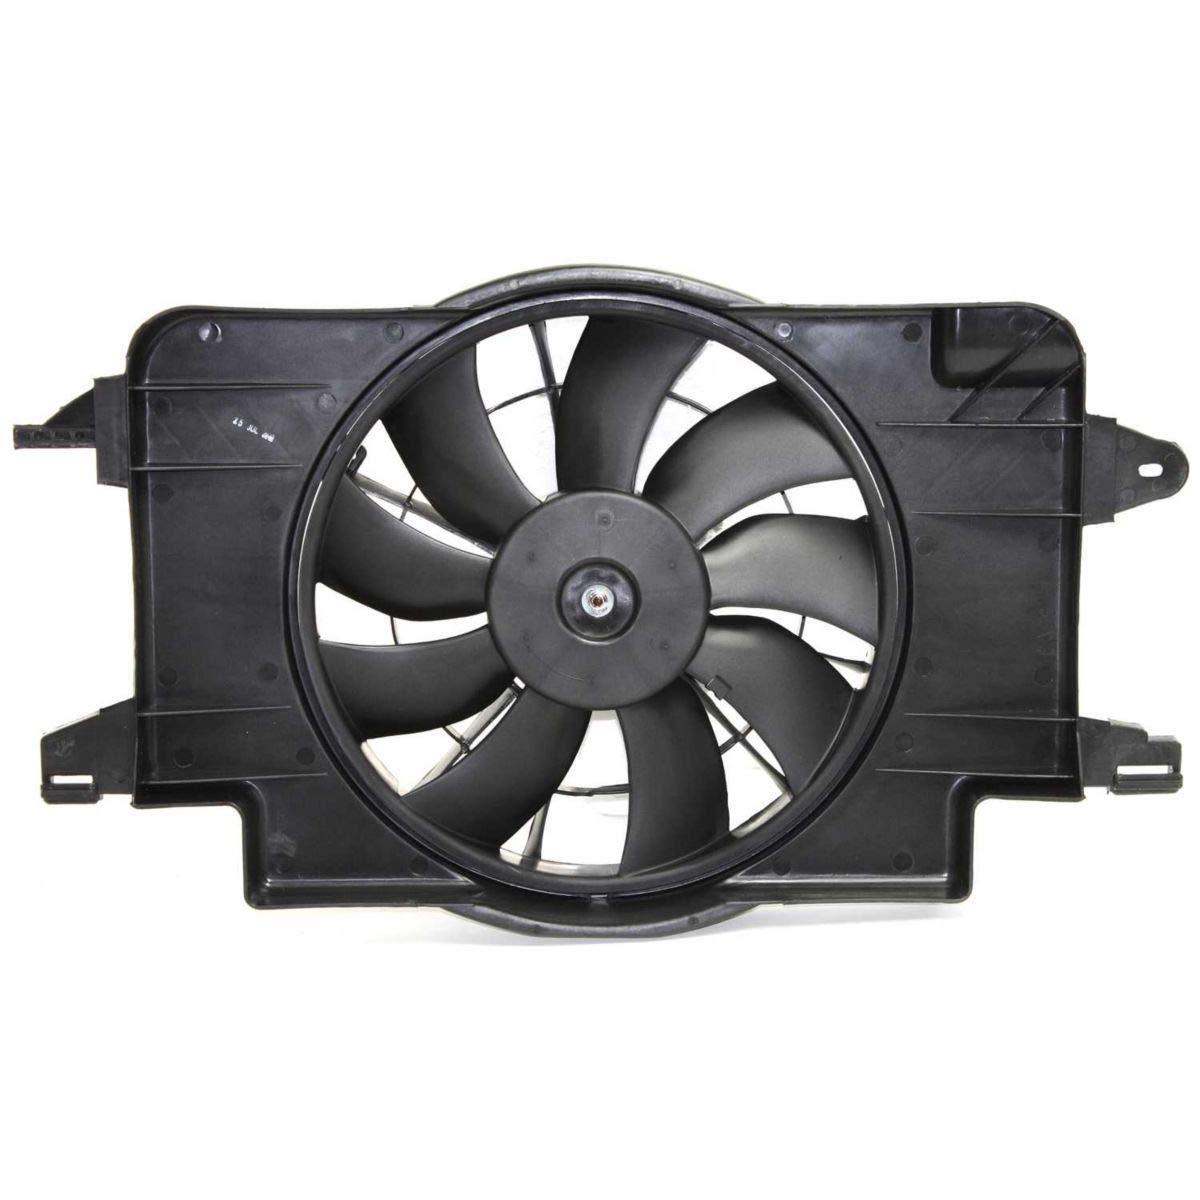 Sunbelt Radiator And Condenser Fan For Saturn SL SL1 GM3115121 Drop in Fitment